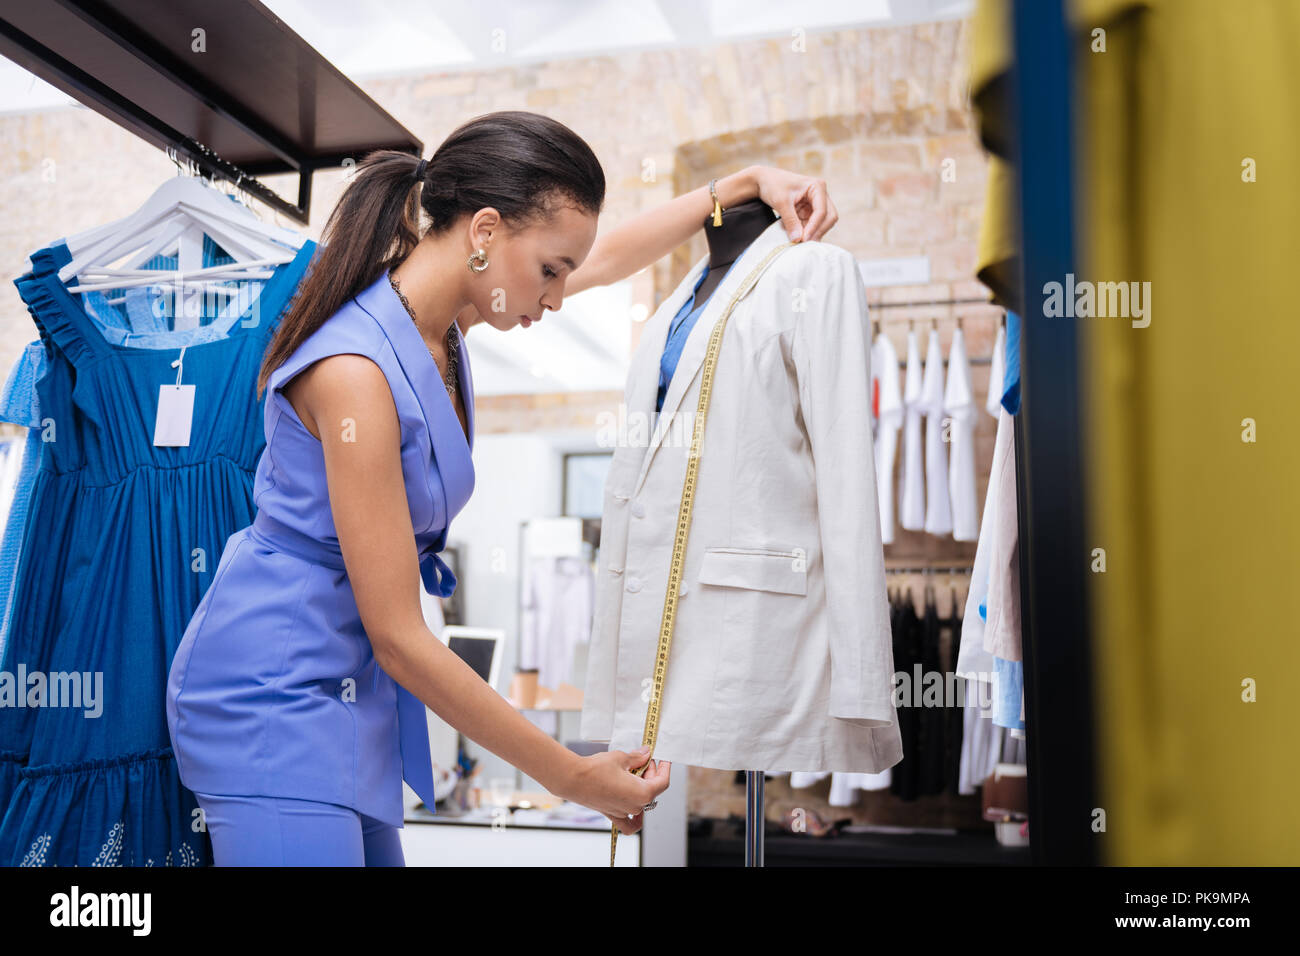 Focused female sale assistant measuring jacket length - Stock Image